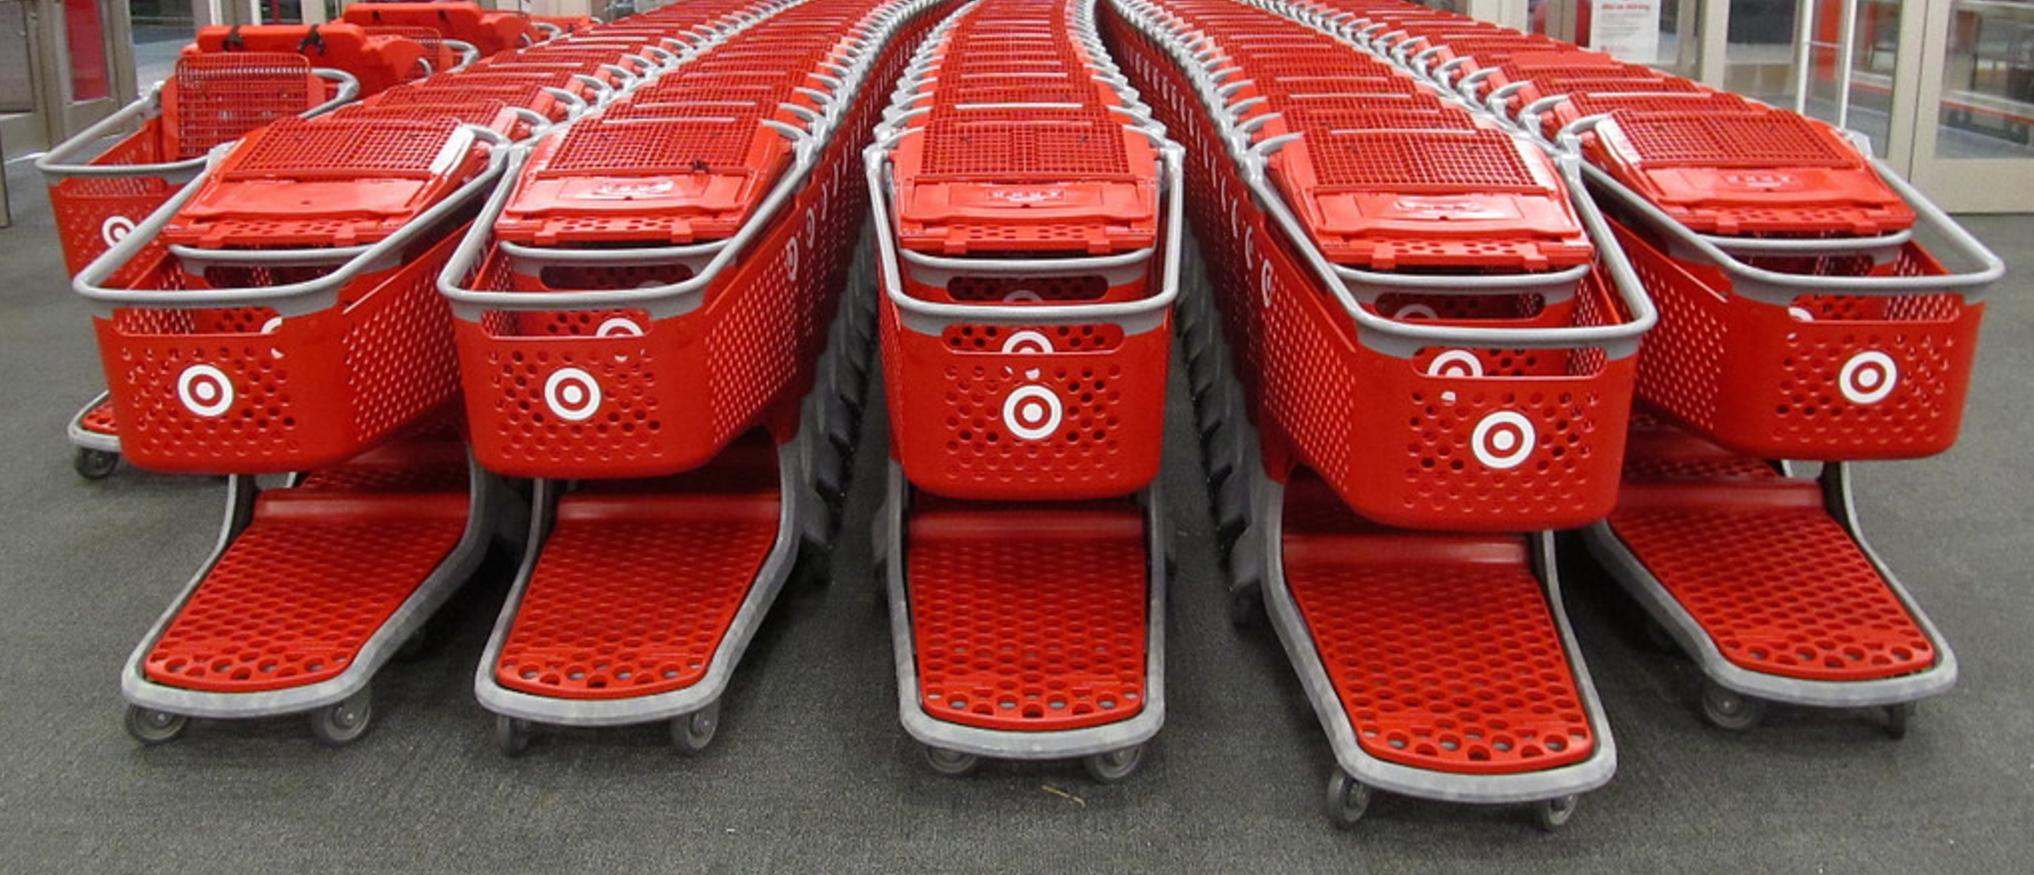 Two Reasons Target Is Having Trouble Selling Groceries